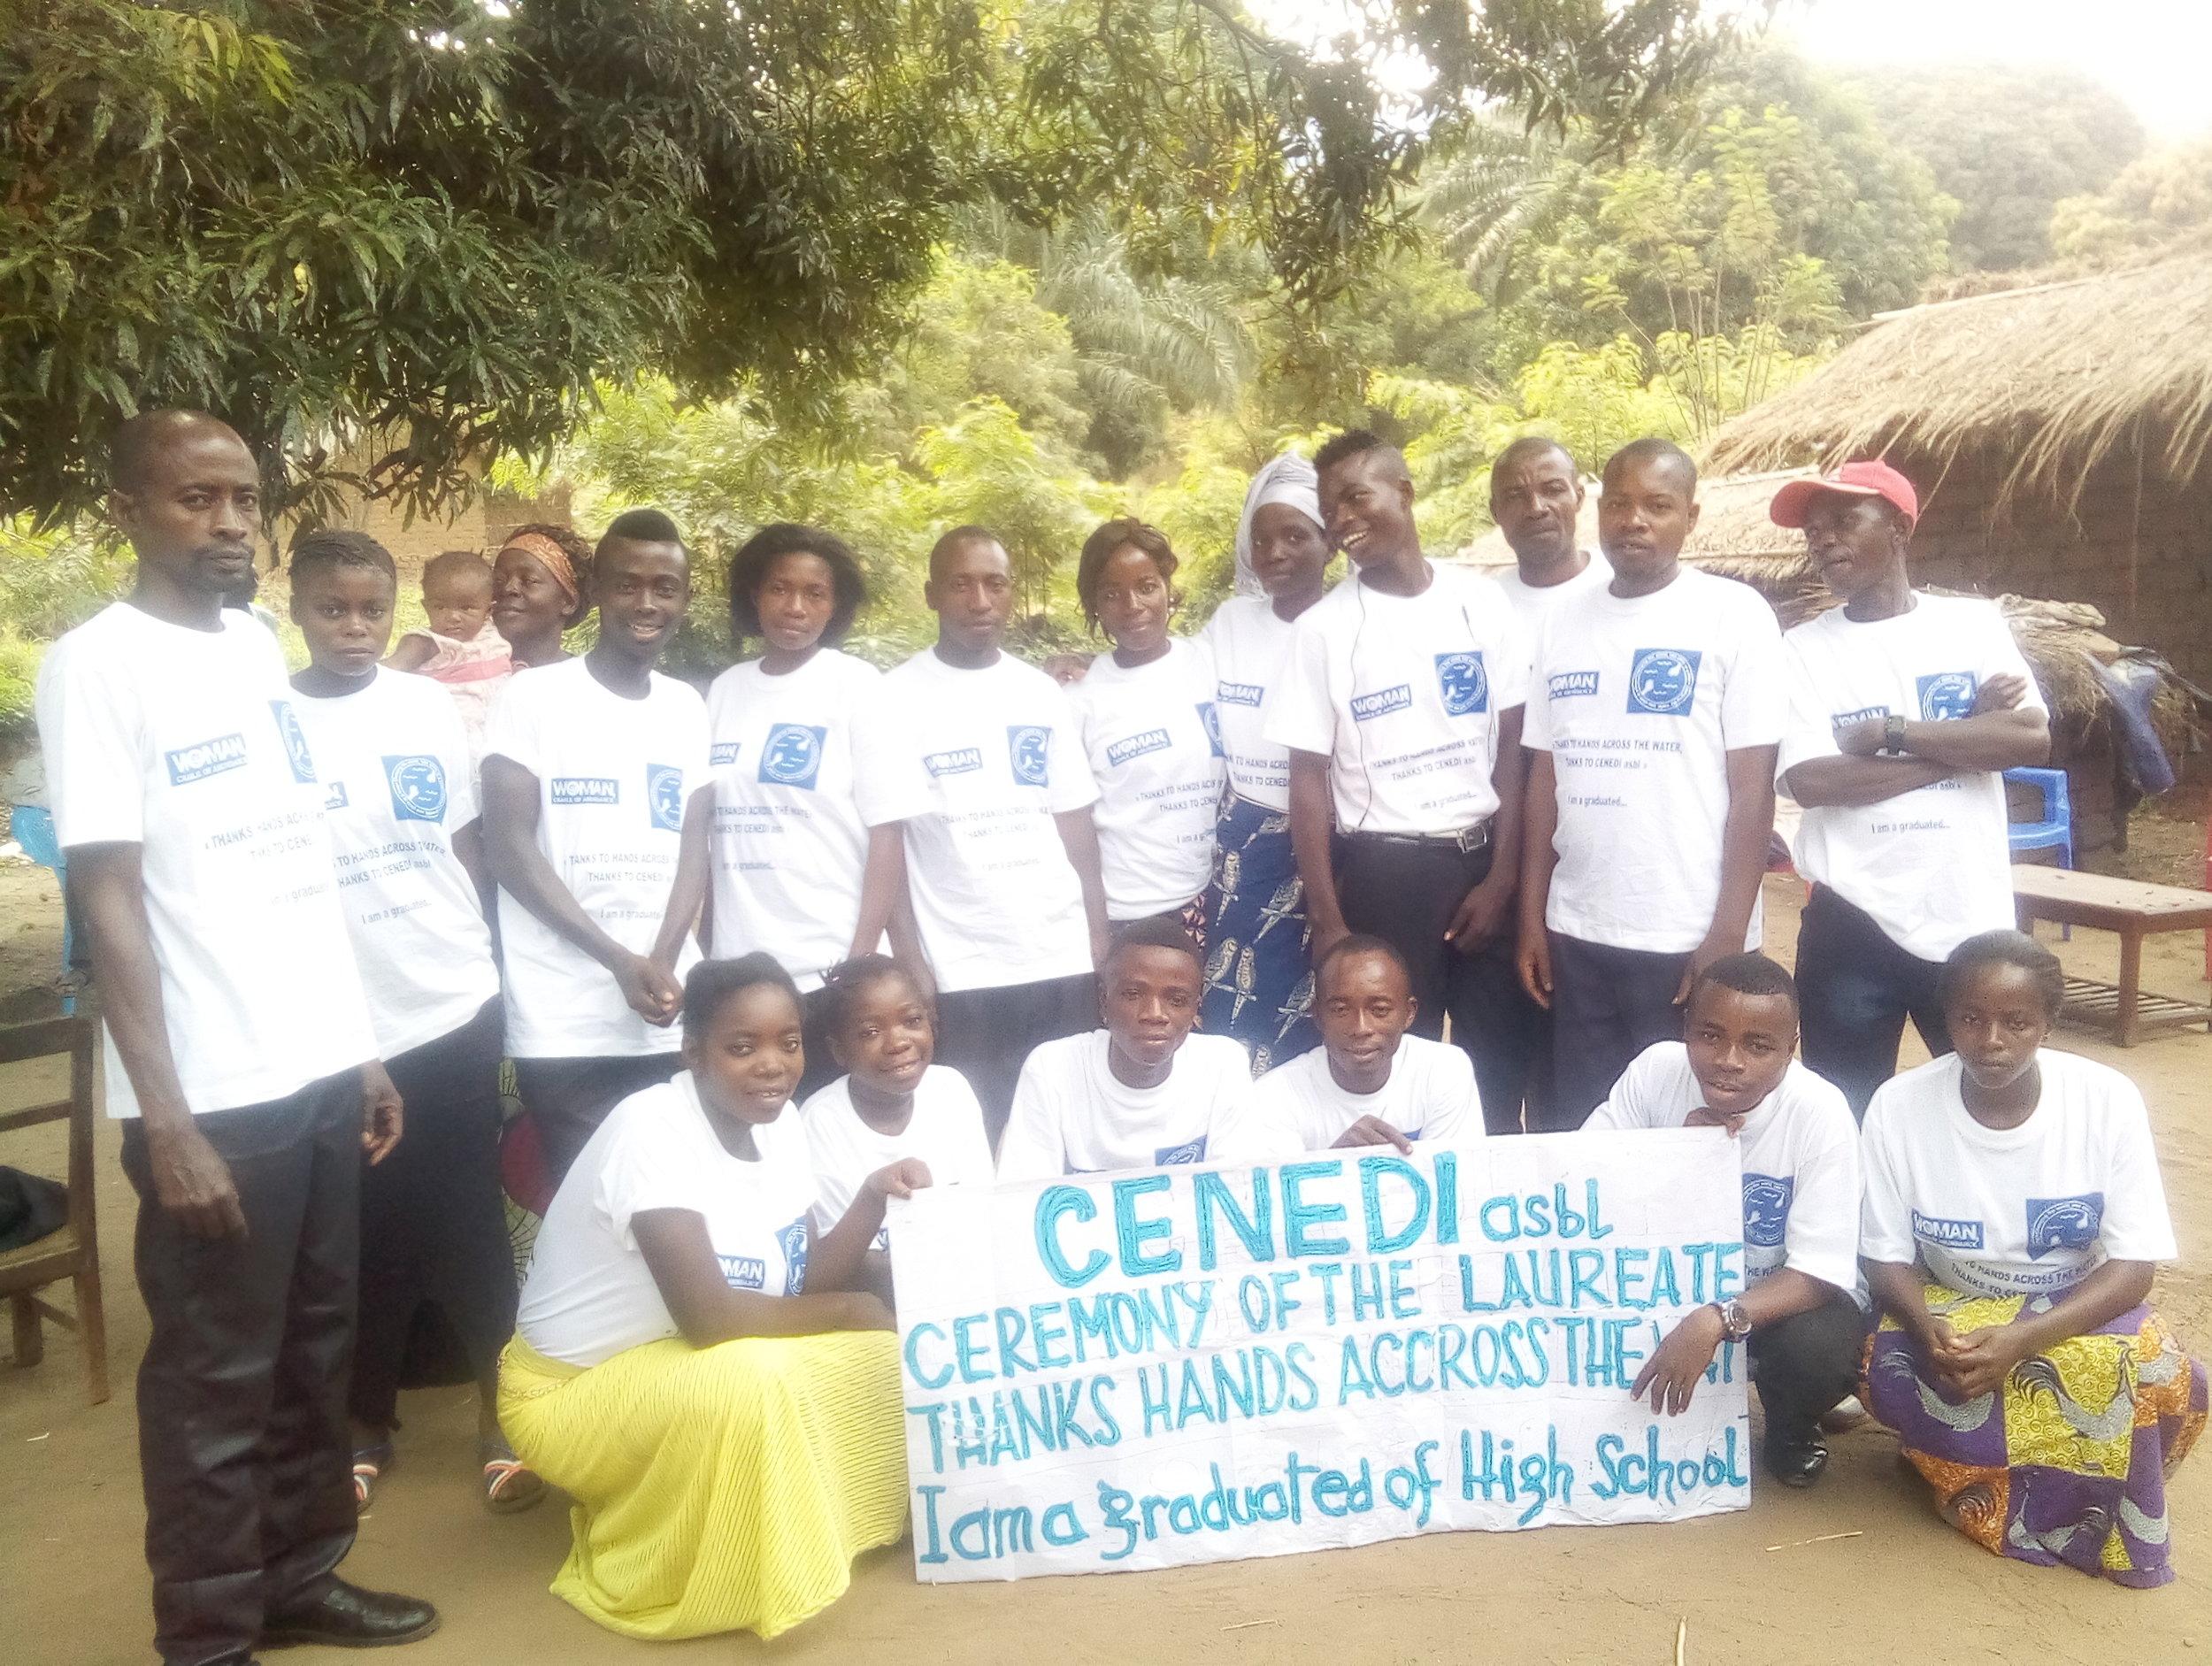 Celebration of our high school graduates - October 2018